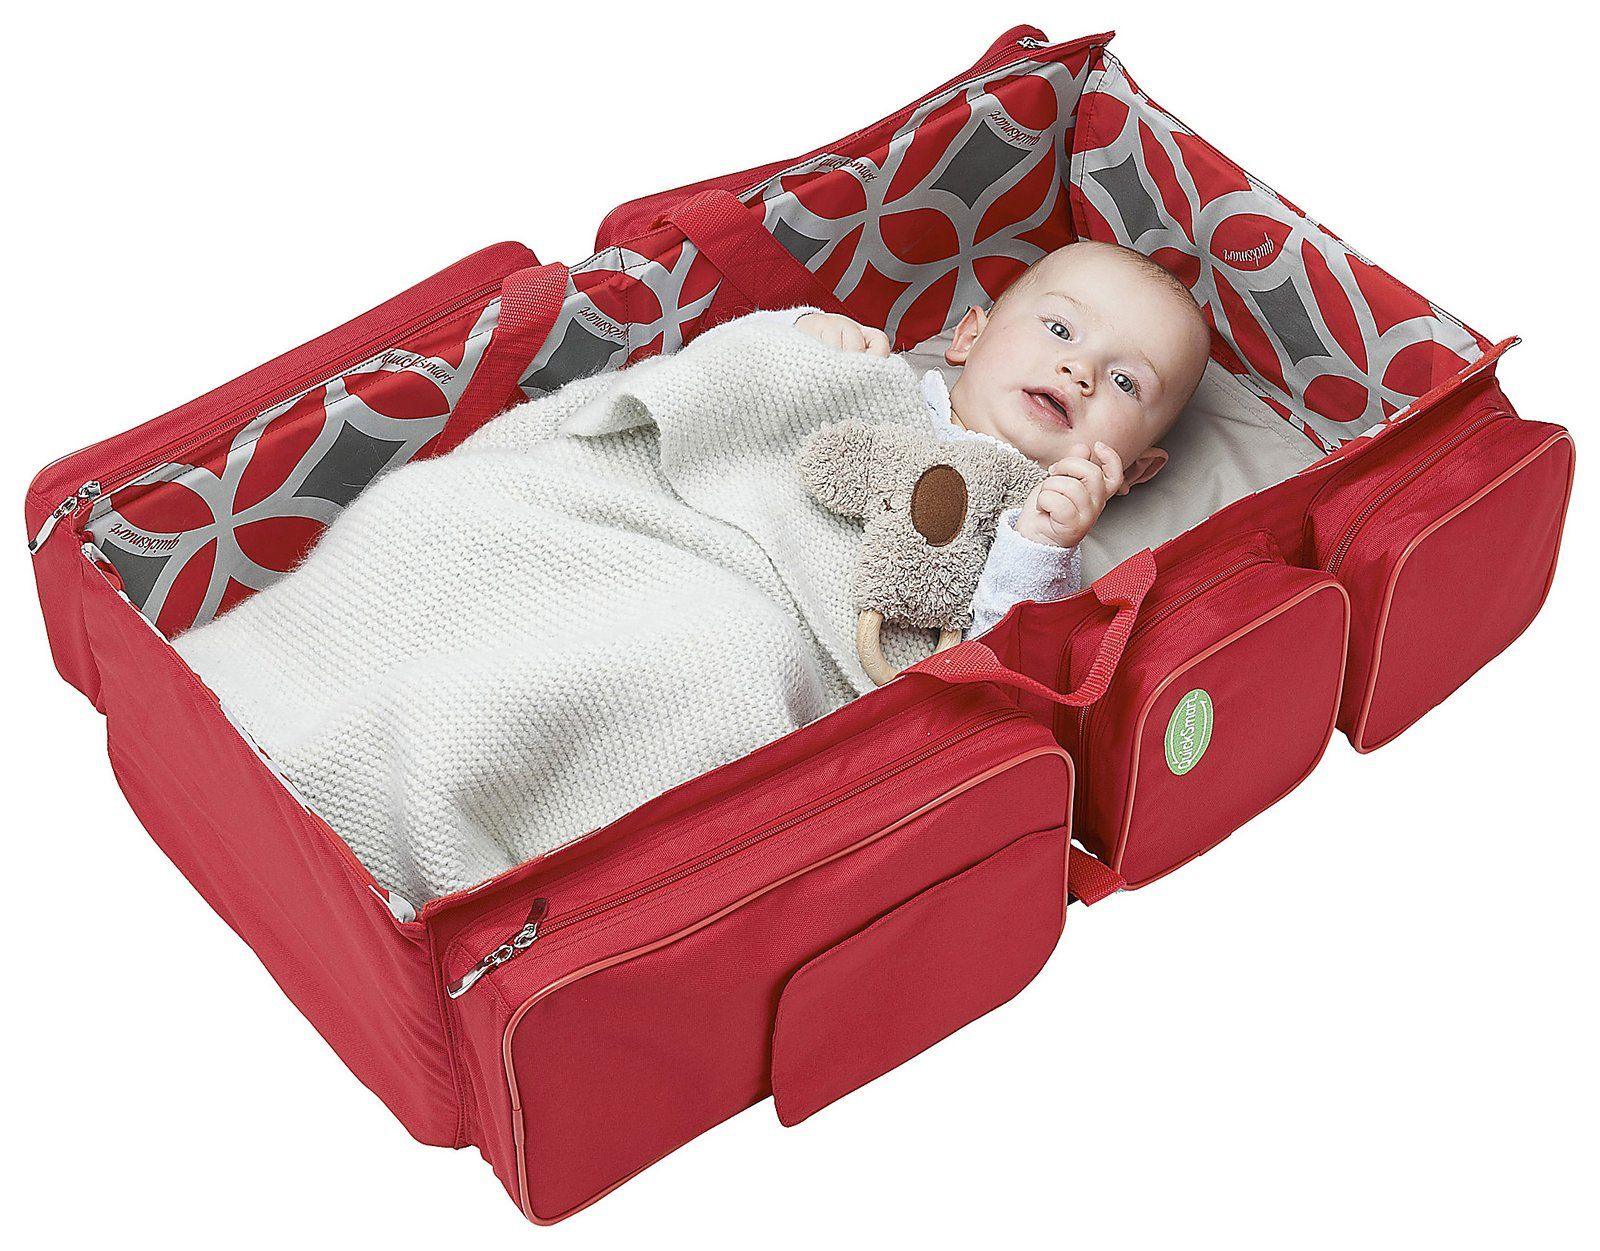 Portable folding bed in a bag - Quicksmart Convertible Travel Bassinet And Diaper Bag